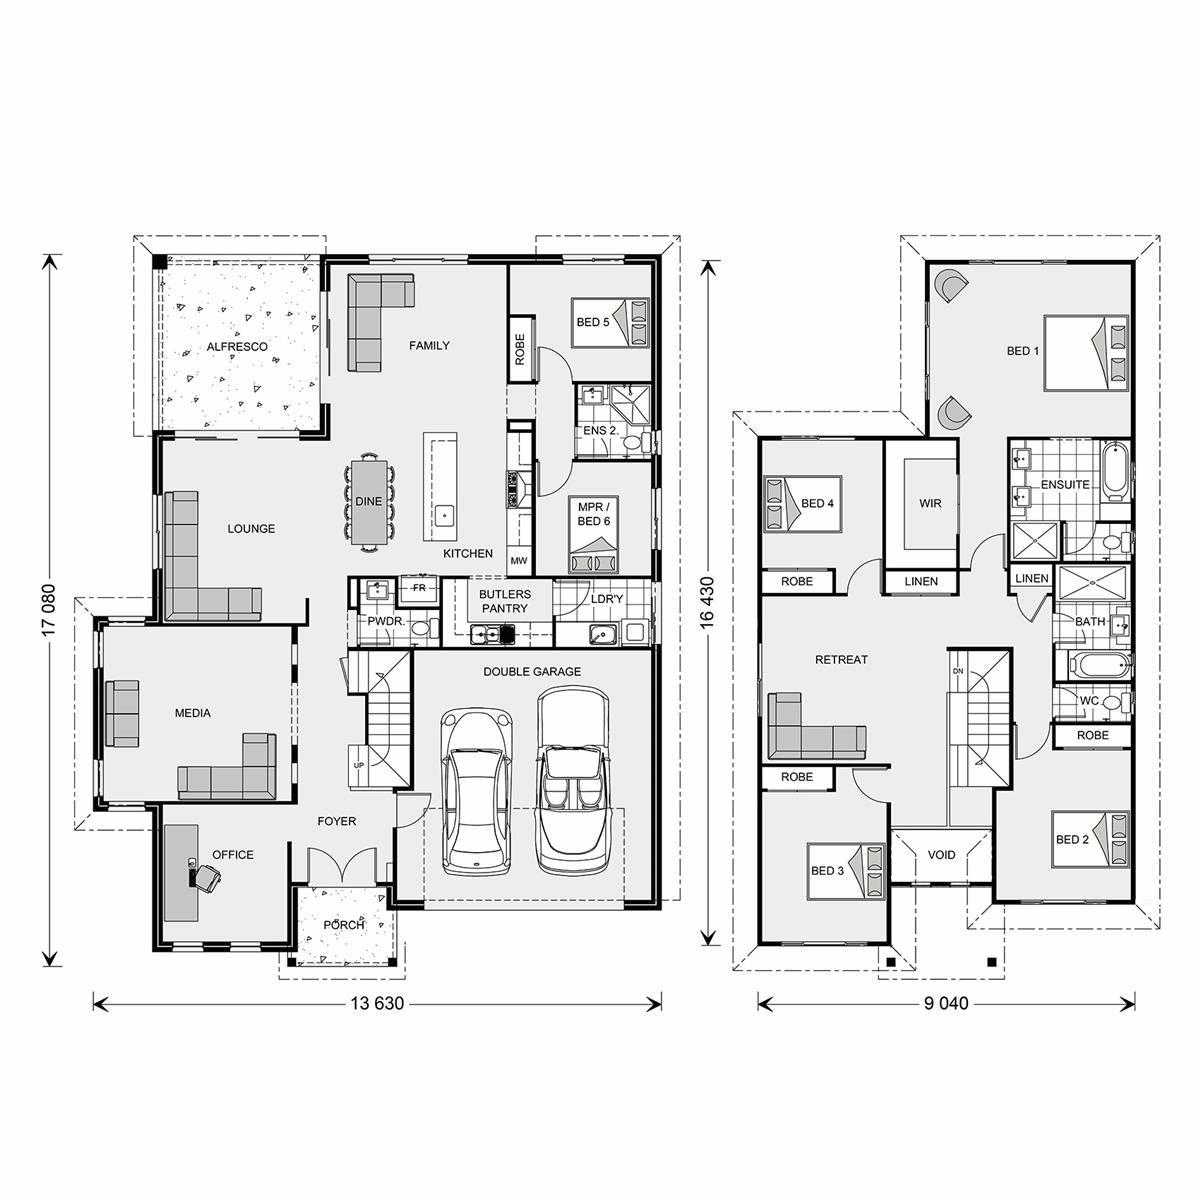 Twin waters element home designs in perth west   gardner homes also rh pinterest